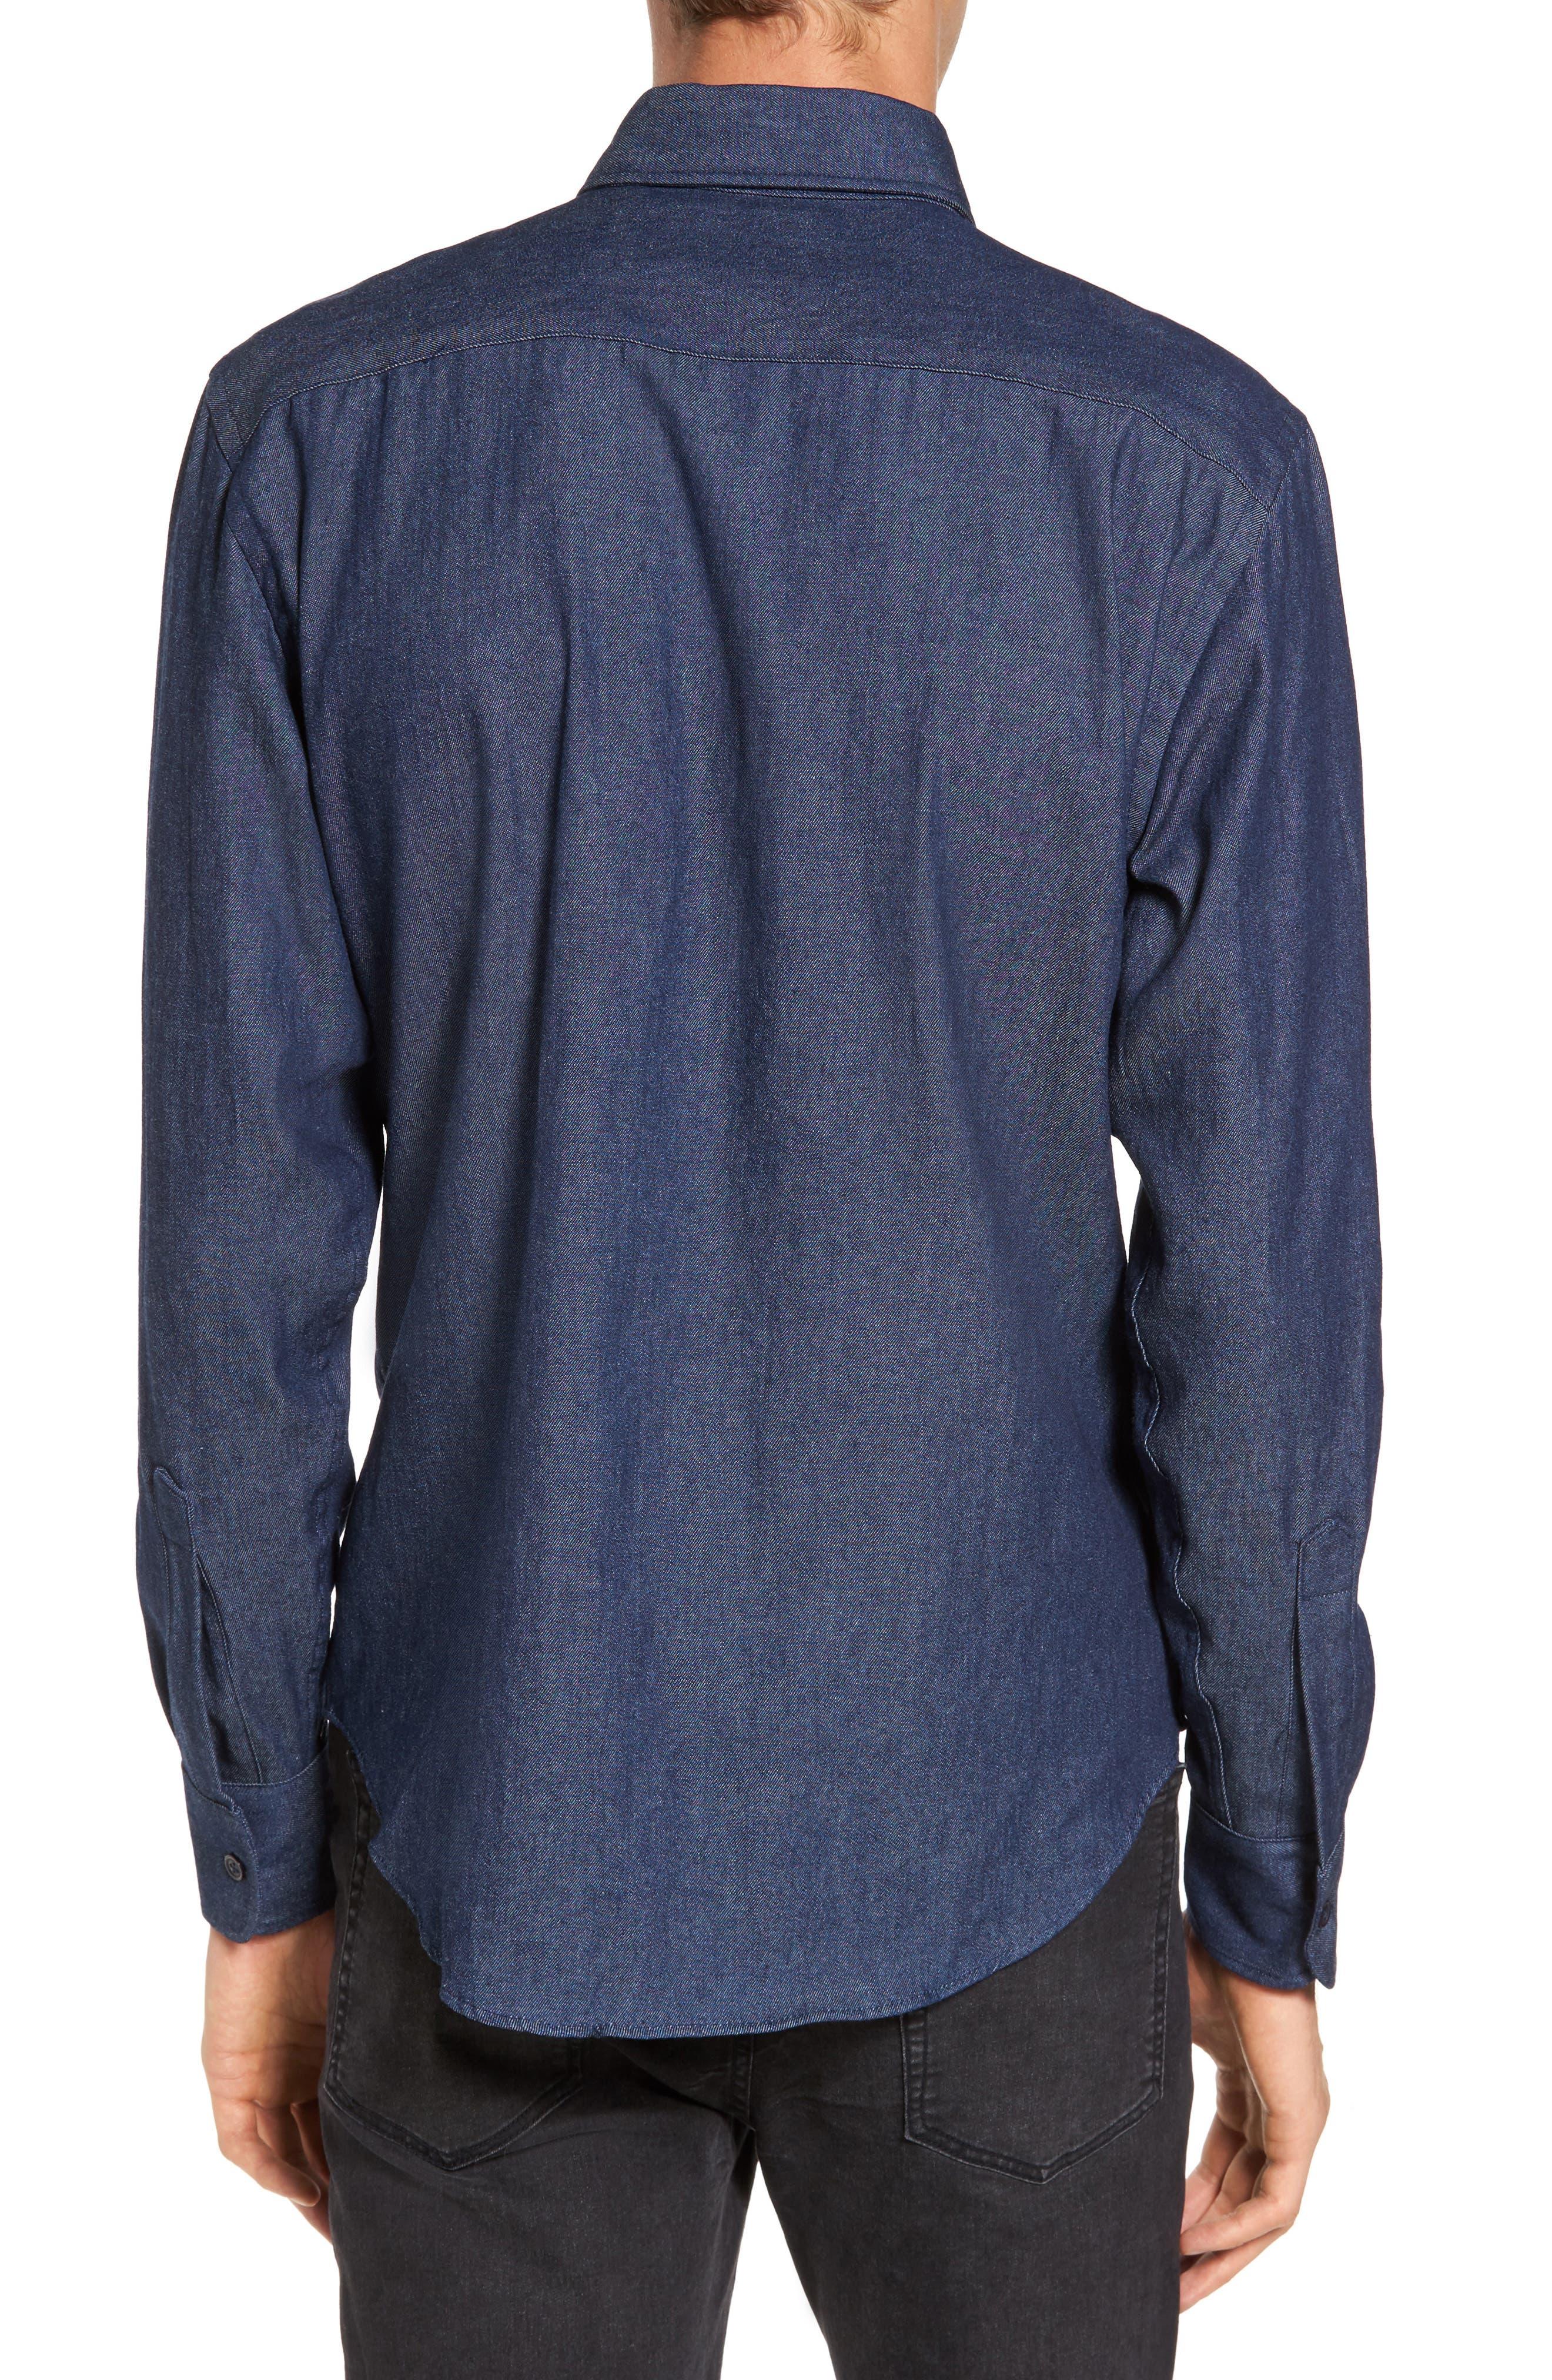 Indigo Long Sleeve Shirt,                             Alternate thumbnail 2, color,                             401